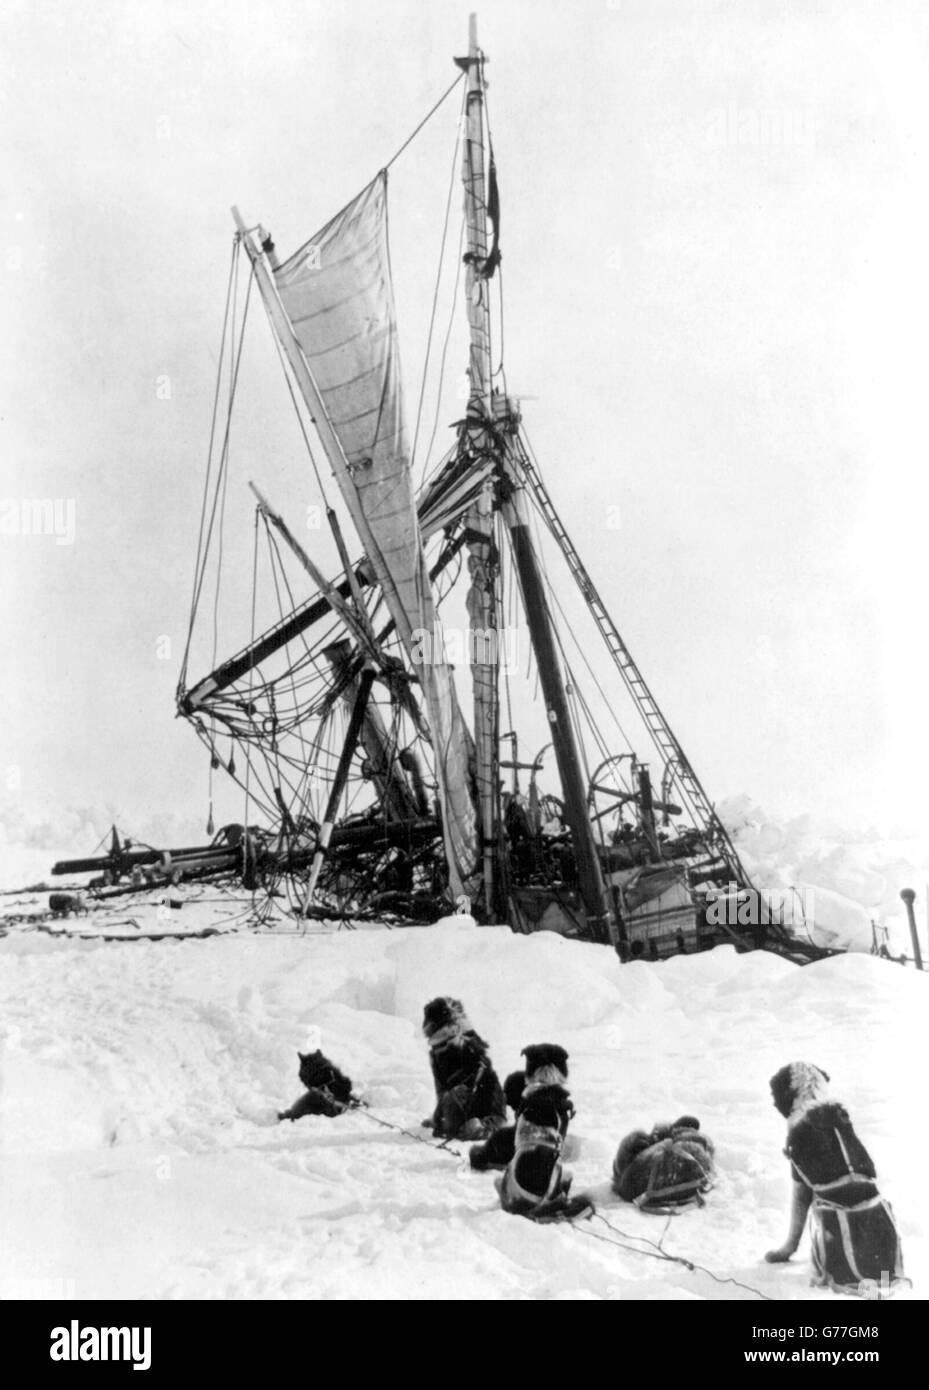 Ernest Shackleton, Endurance. Sir Ernest Shackleton's ship, Endurance, trapped in the ice during the 1914/15 - Stock Image